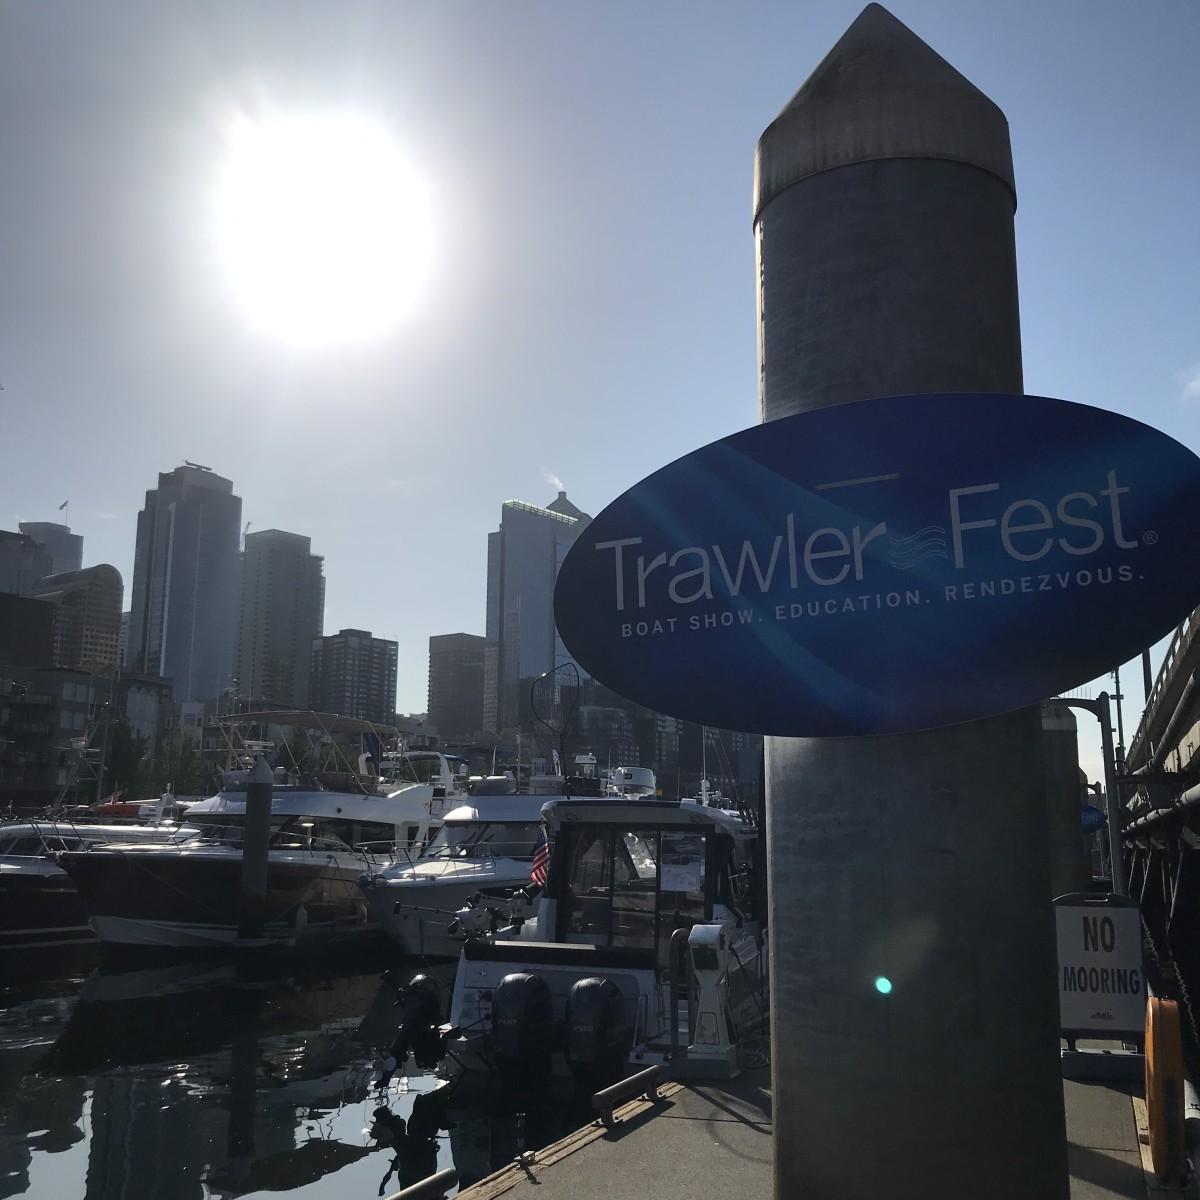 Trawler_1 copy